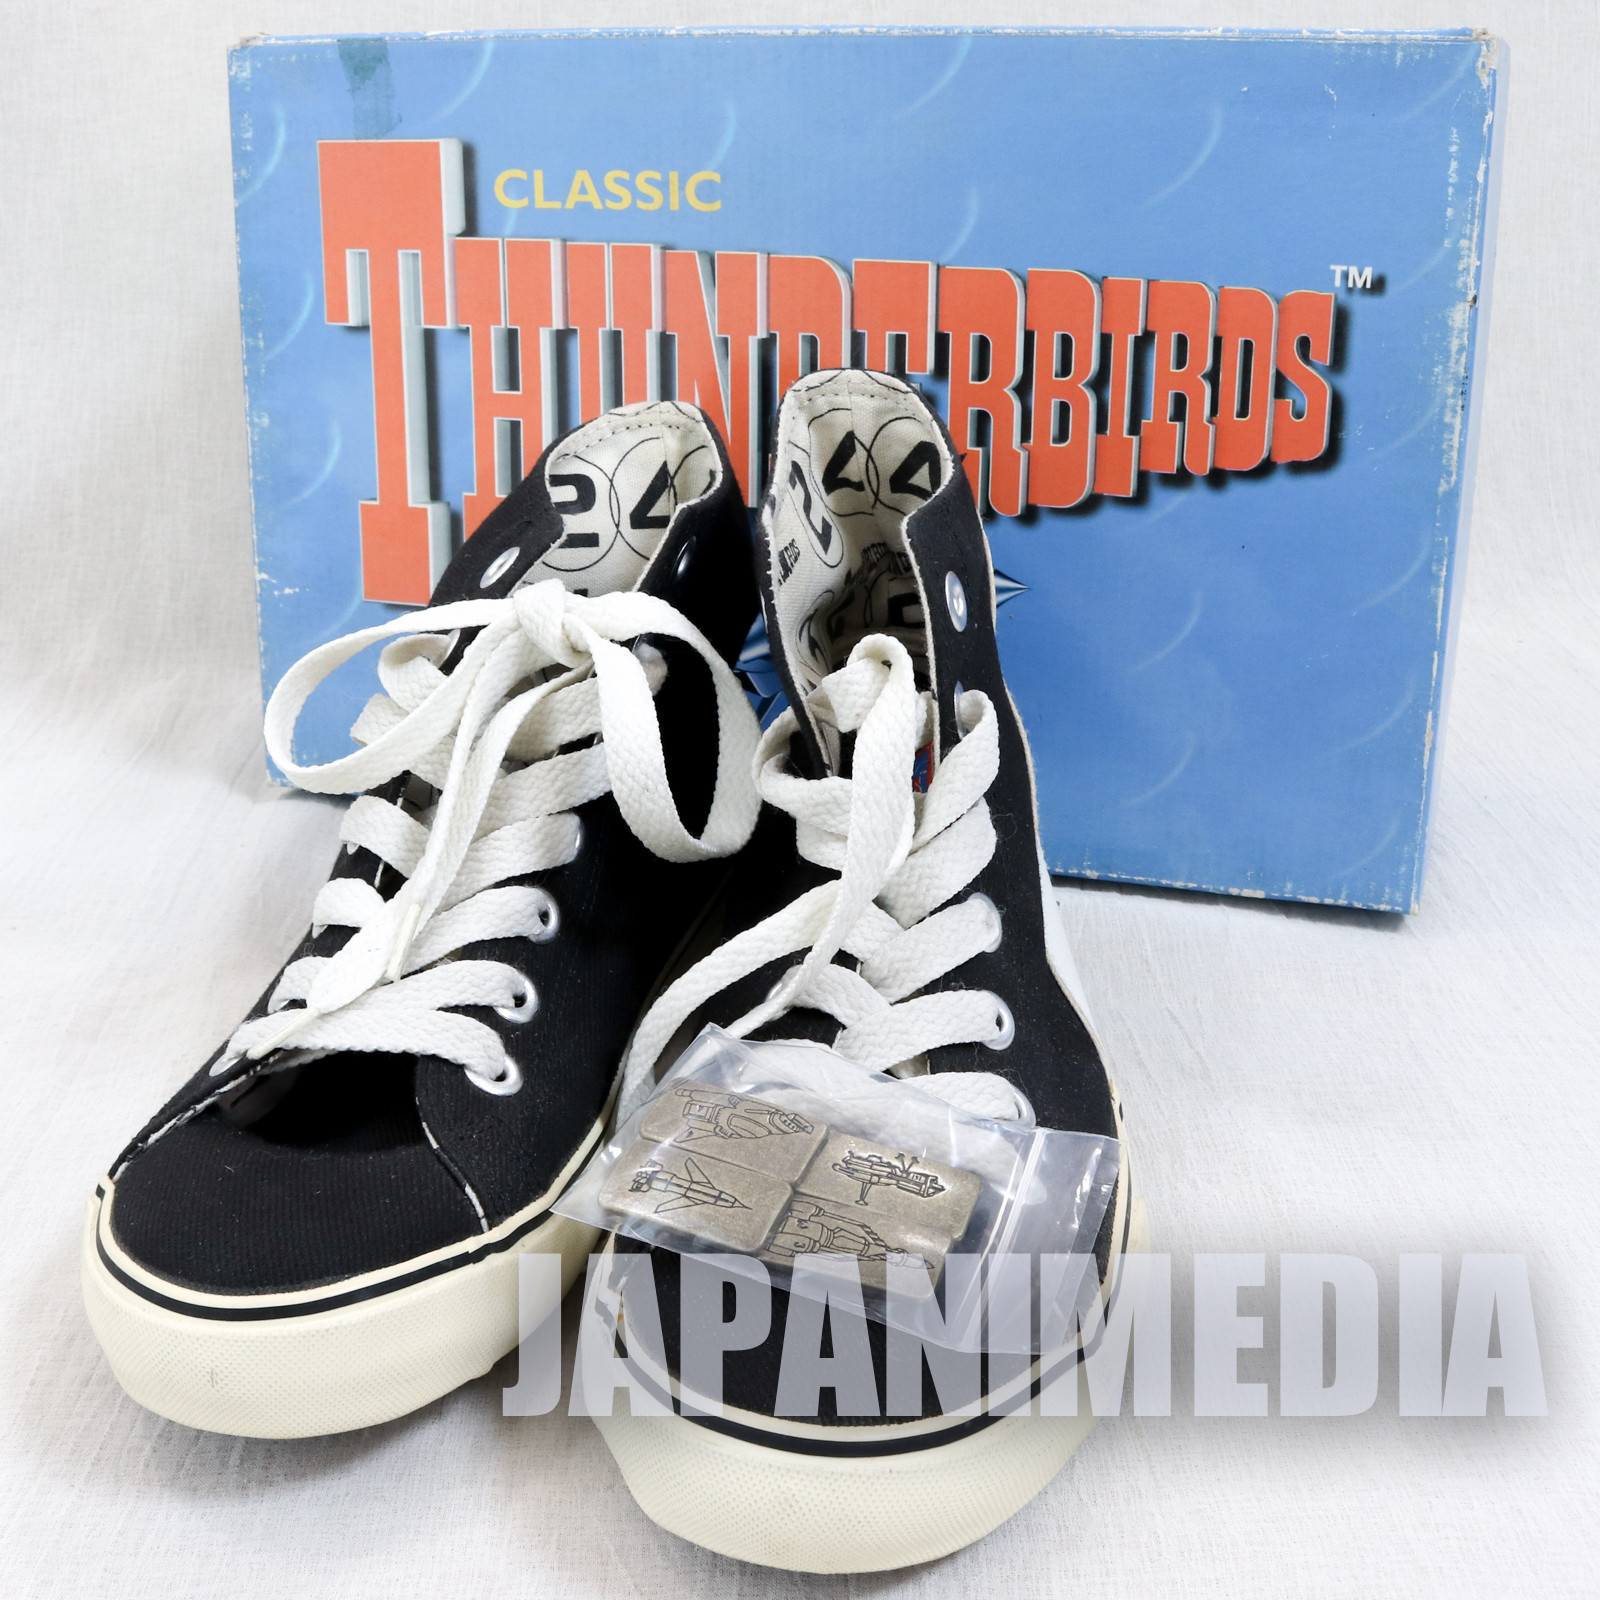 RARE! Classic Thunderbirds Sneakers Shoes Black Japan 24.0cm size